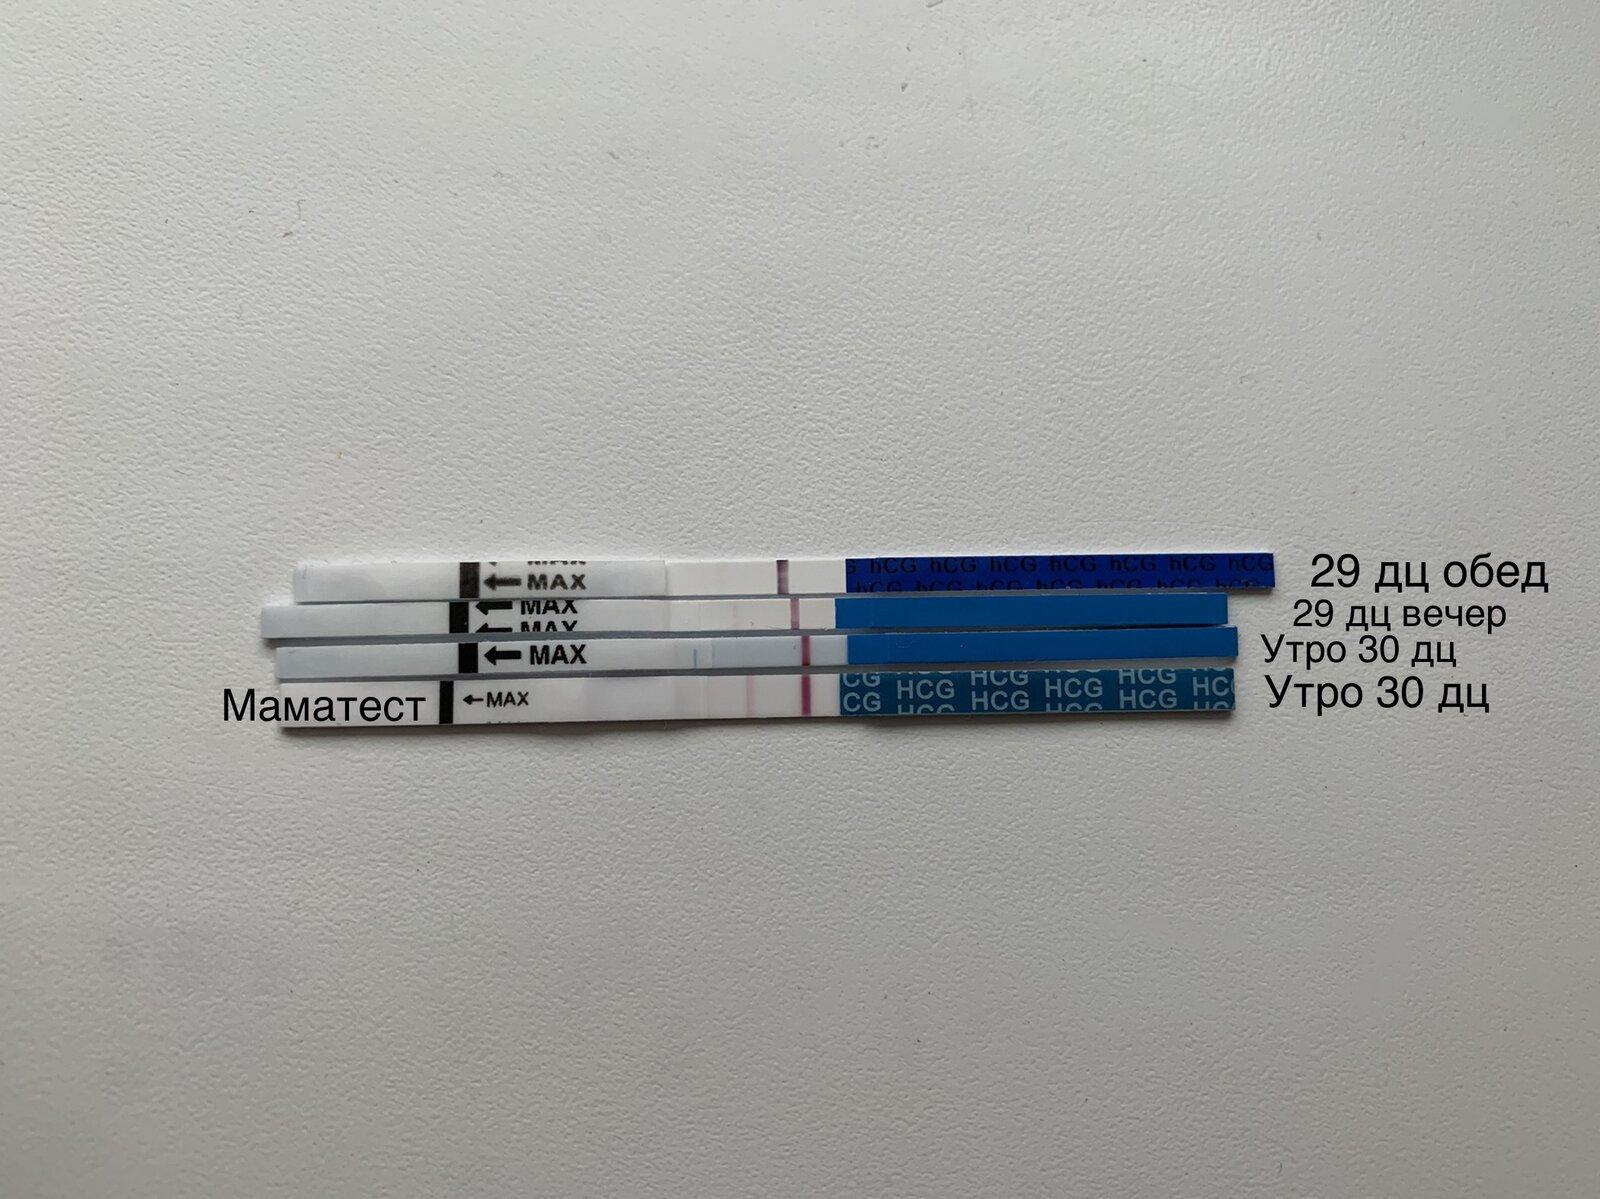 E69DC609-42F7-4CDE-8703-97930F472D82.jpeg